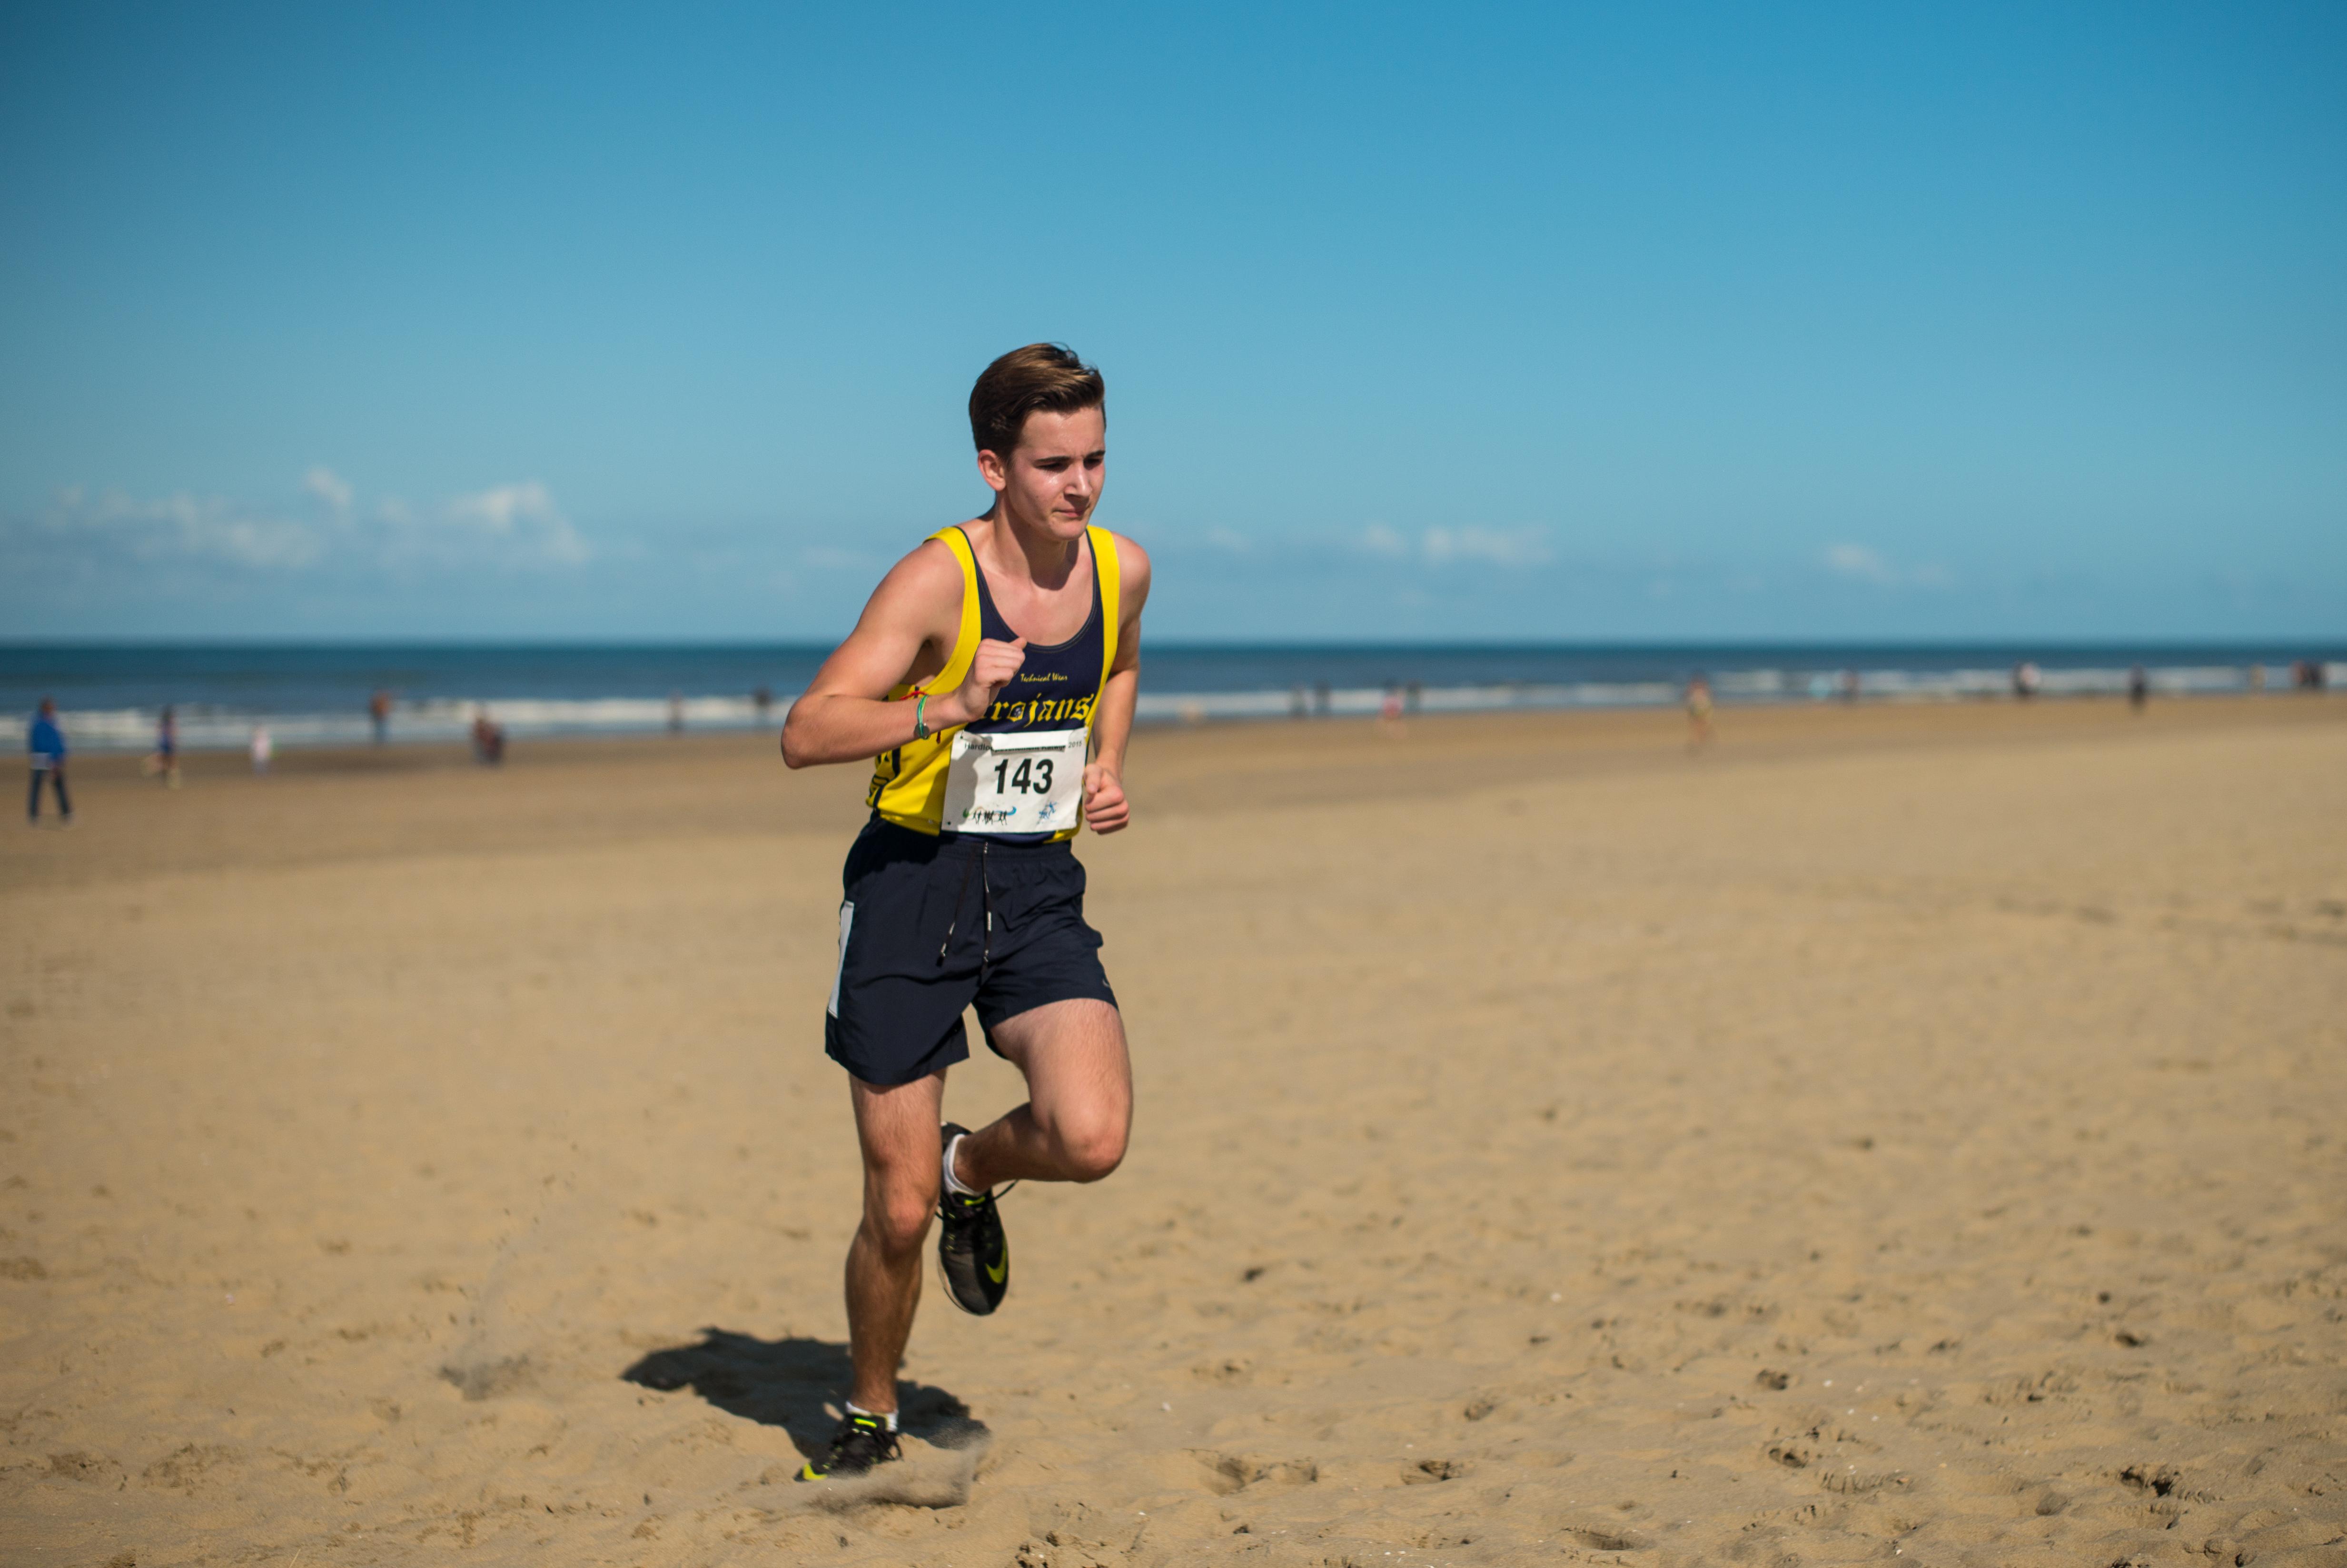 The 5th Kihim Running and Living Beach Half Marathon